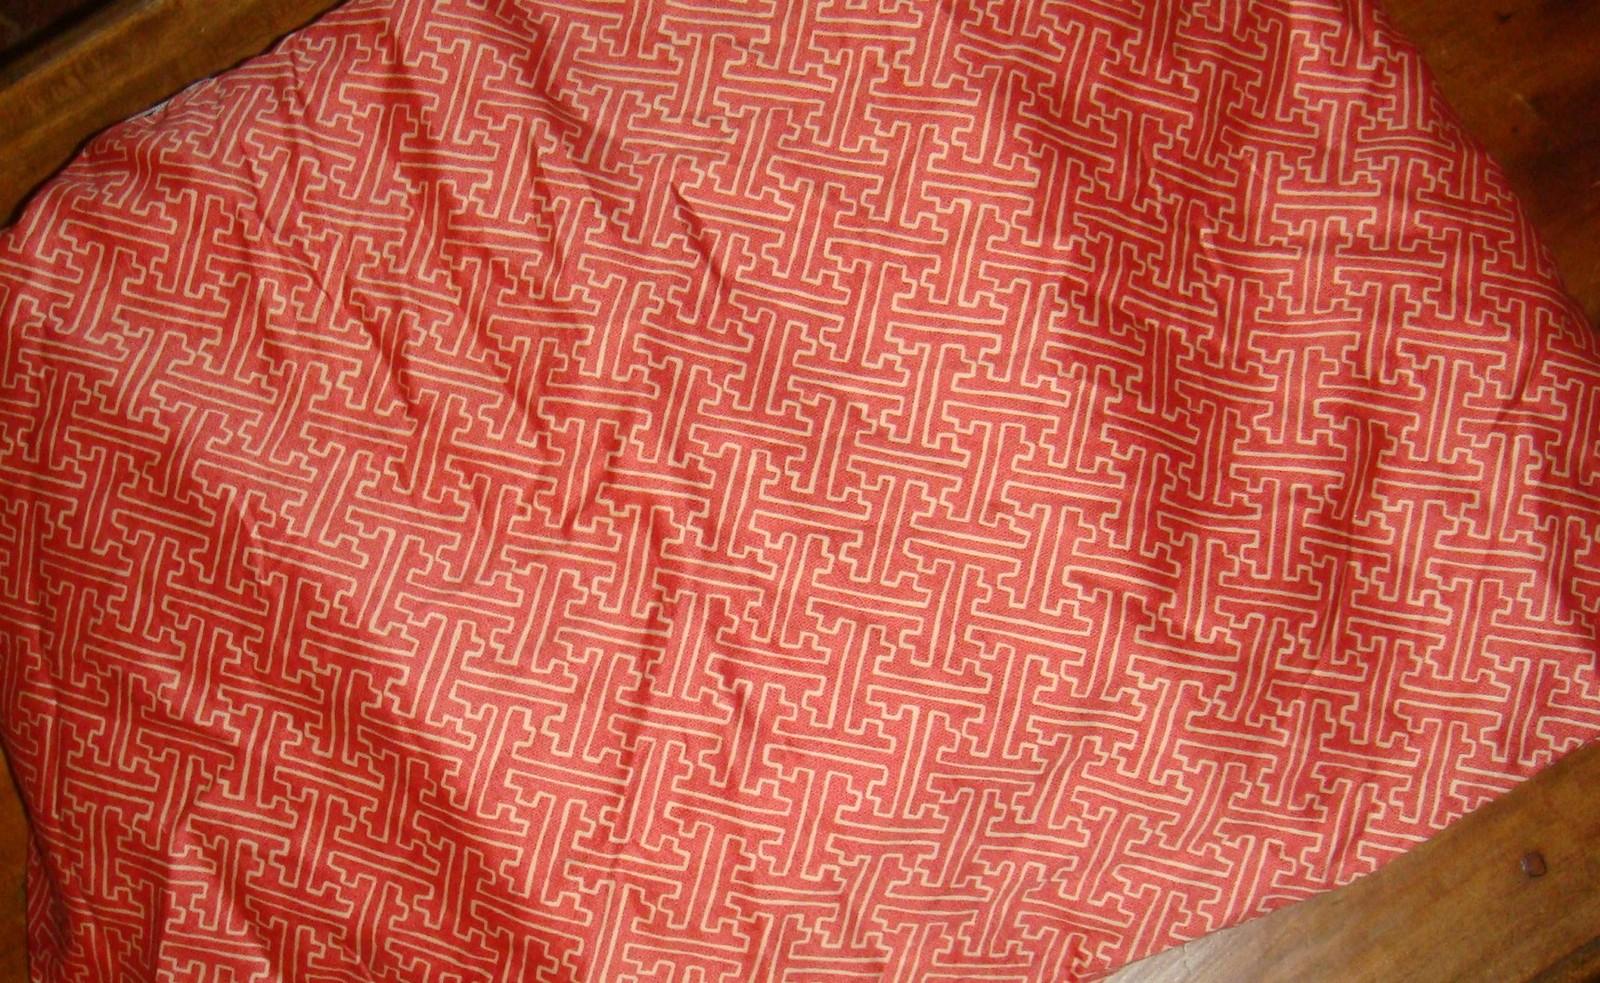 Ralph Lauren Villa Camelia King Bedskirt Fretwork 18 Inch Drop Tailored Bed Skirts